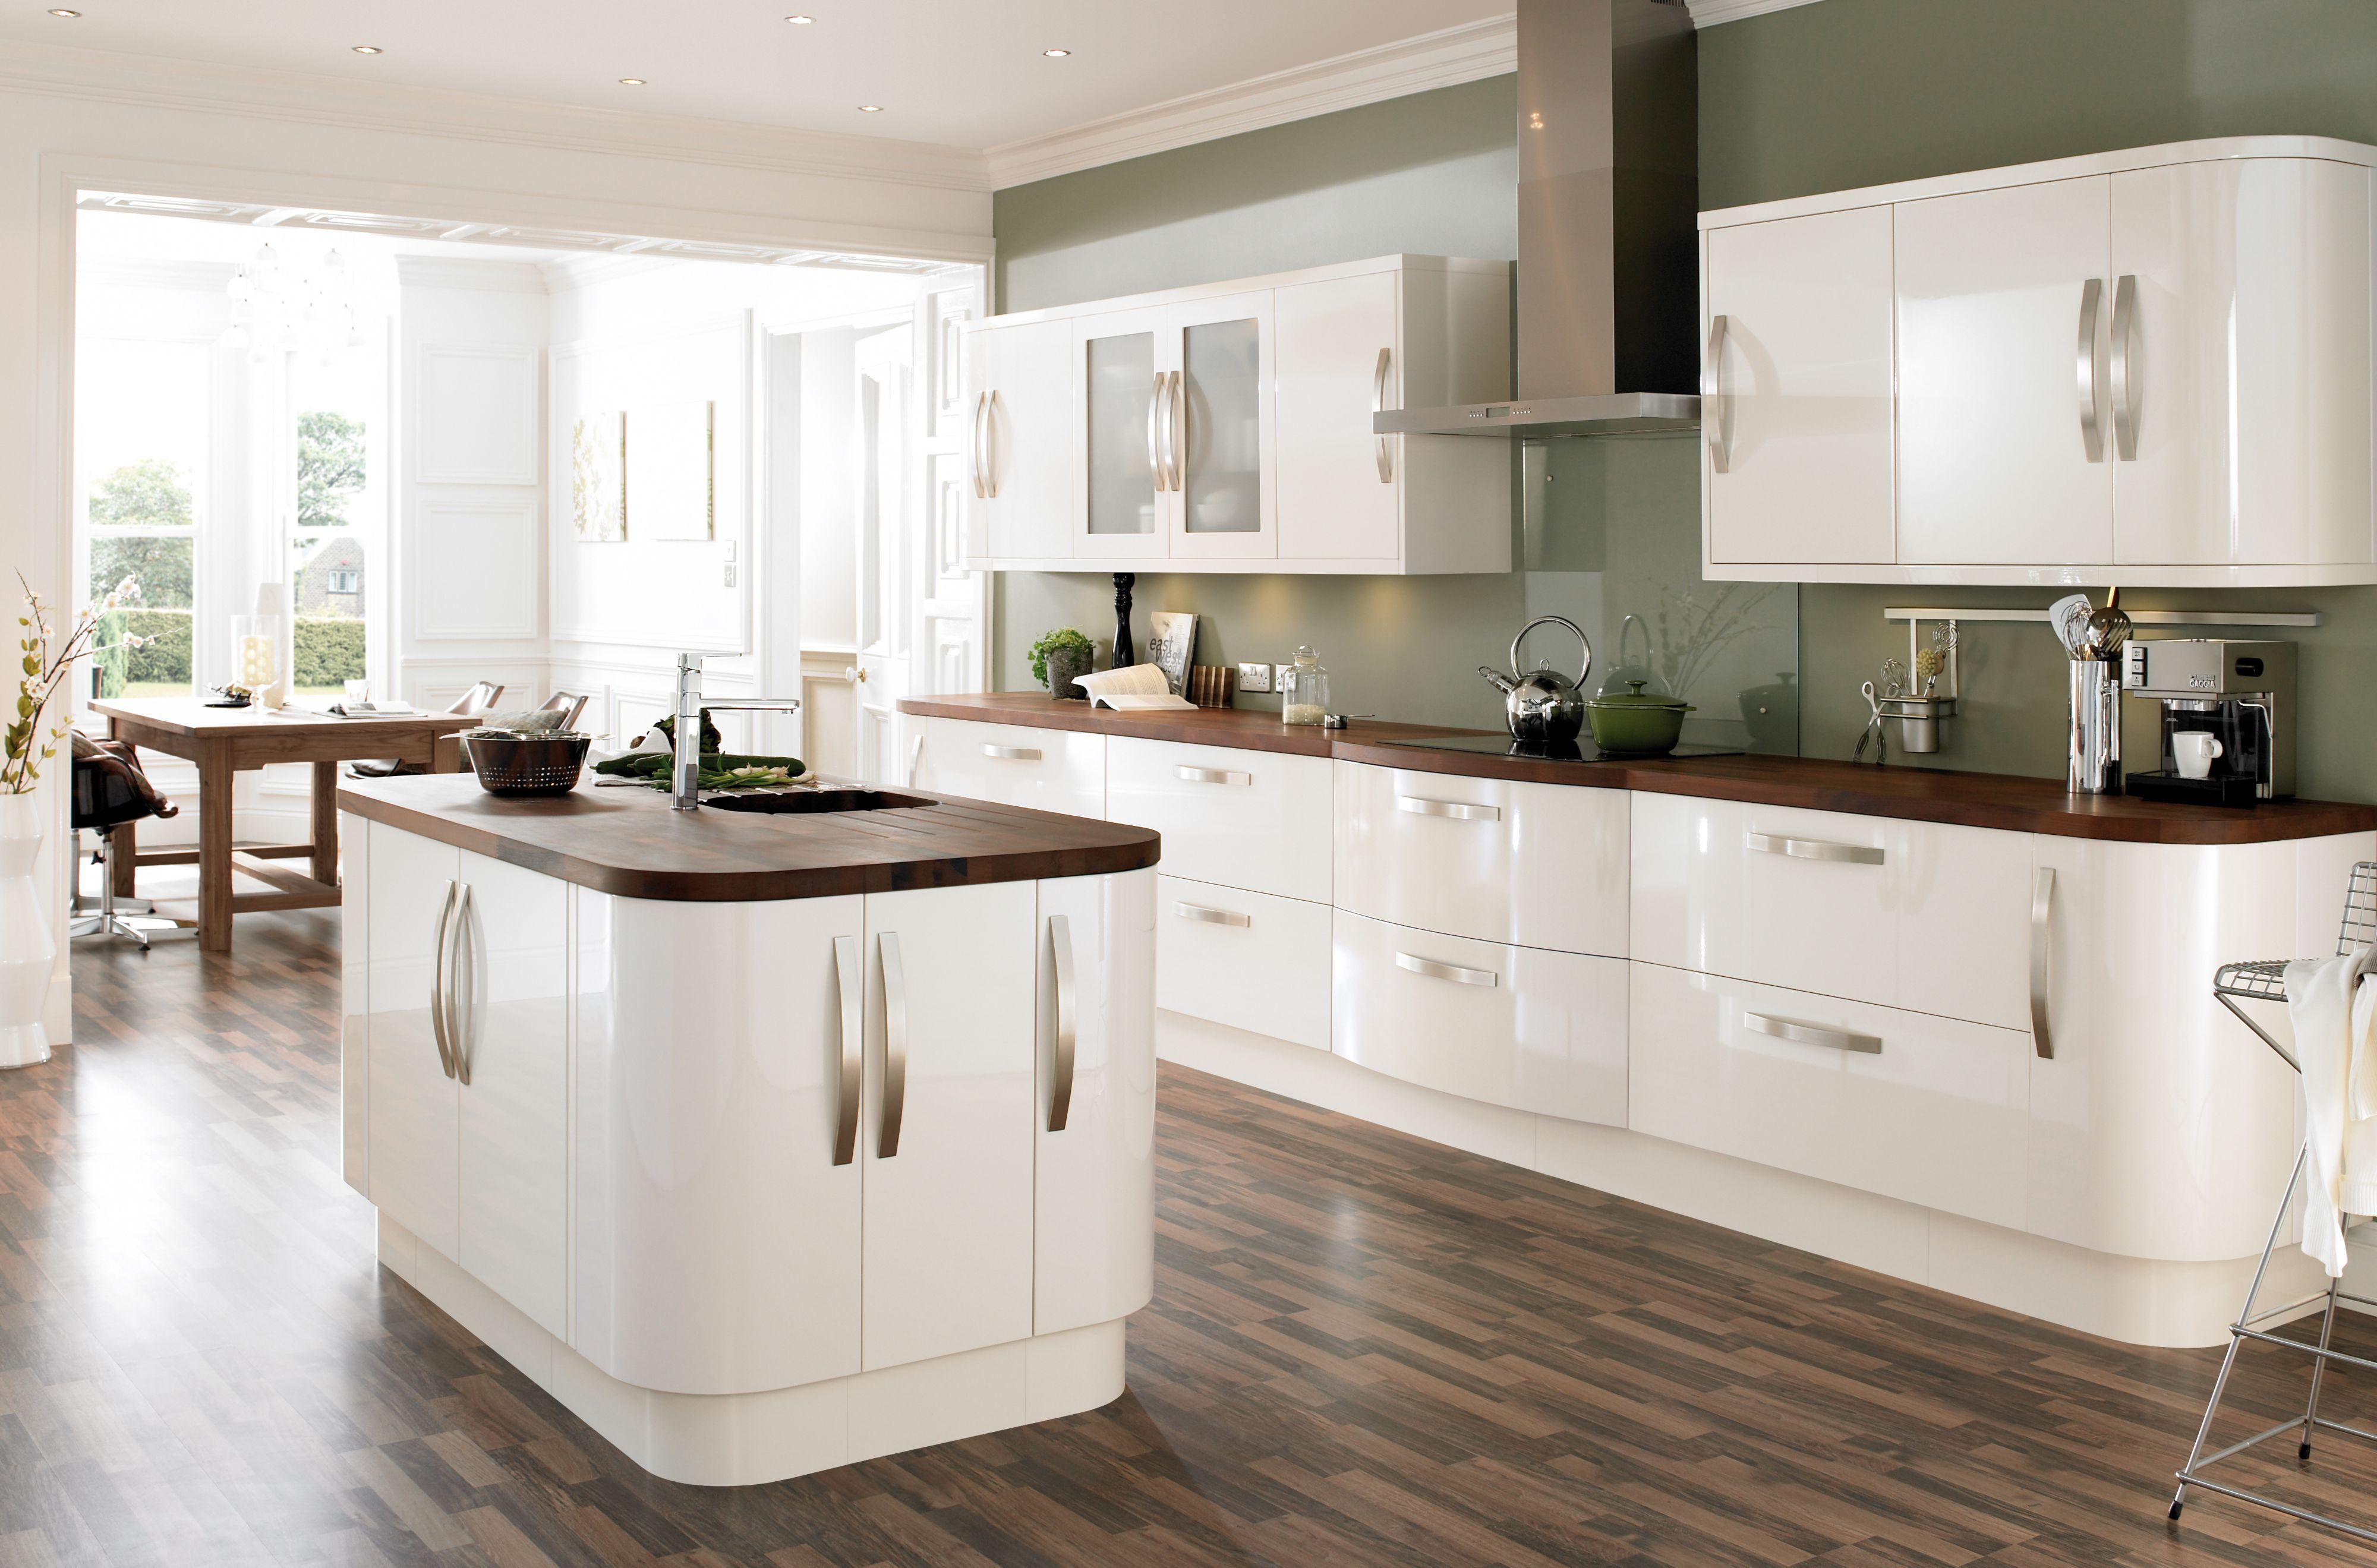 Big Space Kitchen Range Reviews In Oven Range Hood Reviews Lamp